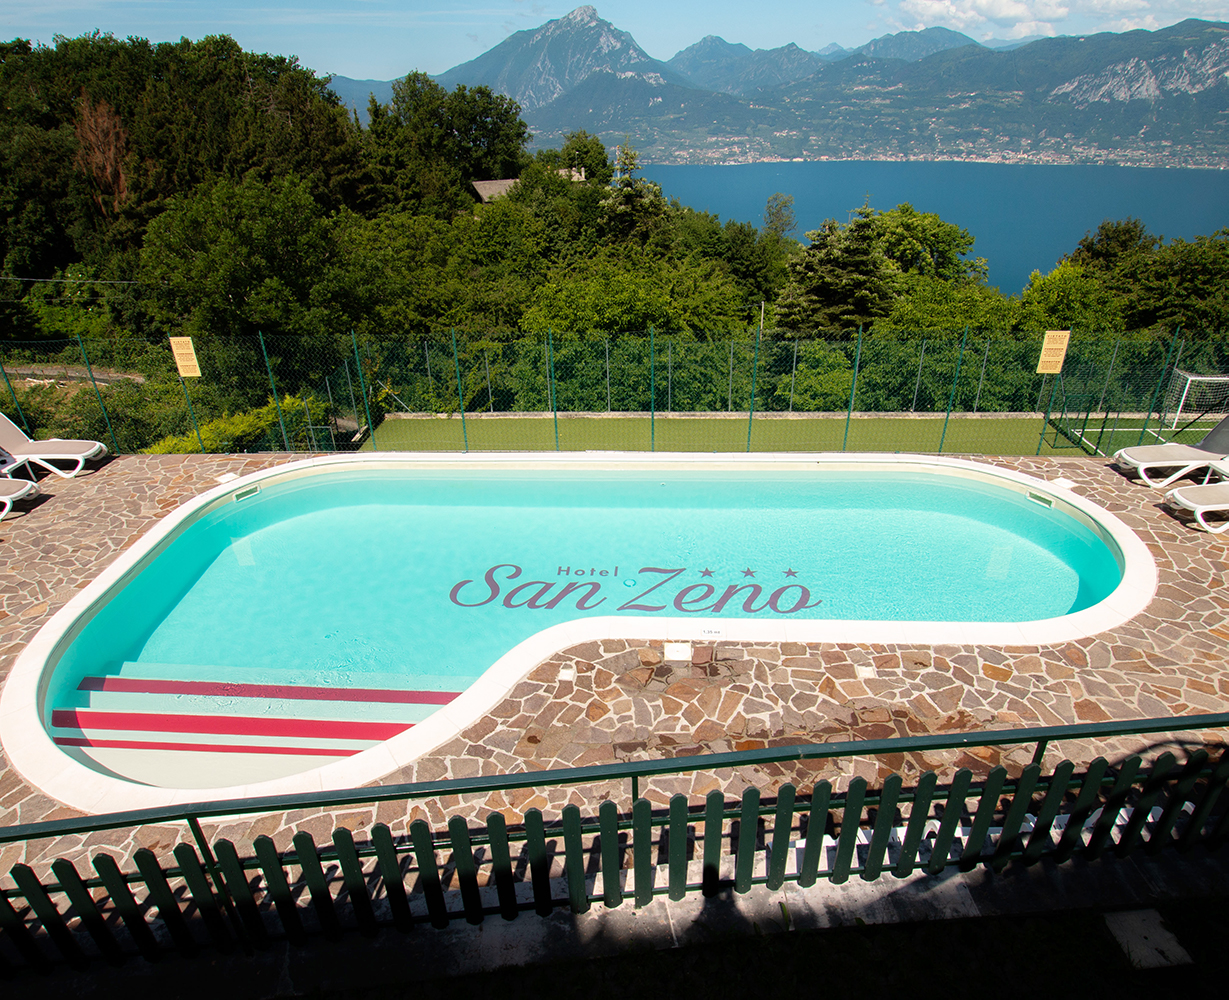 piscina-sul-lago-hotel-san-zeno